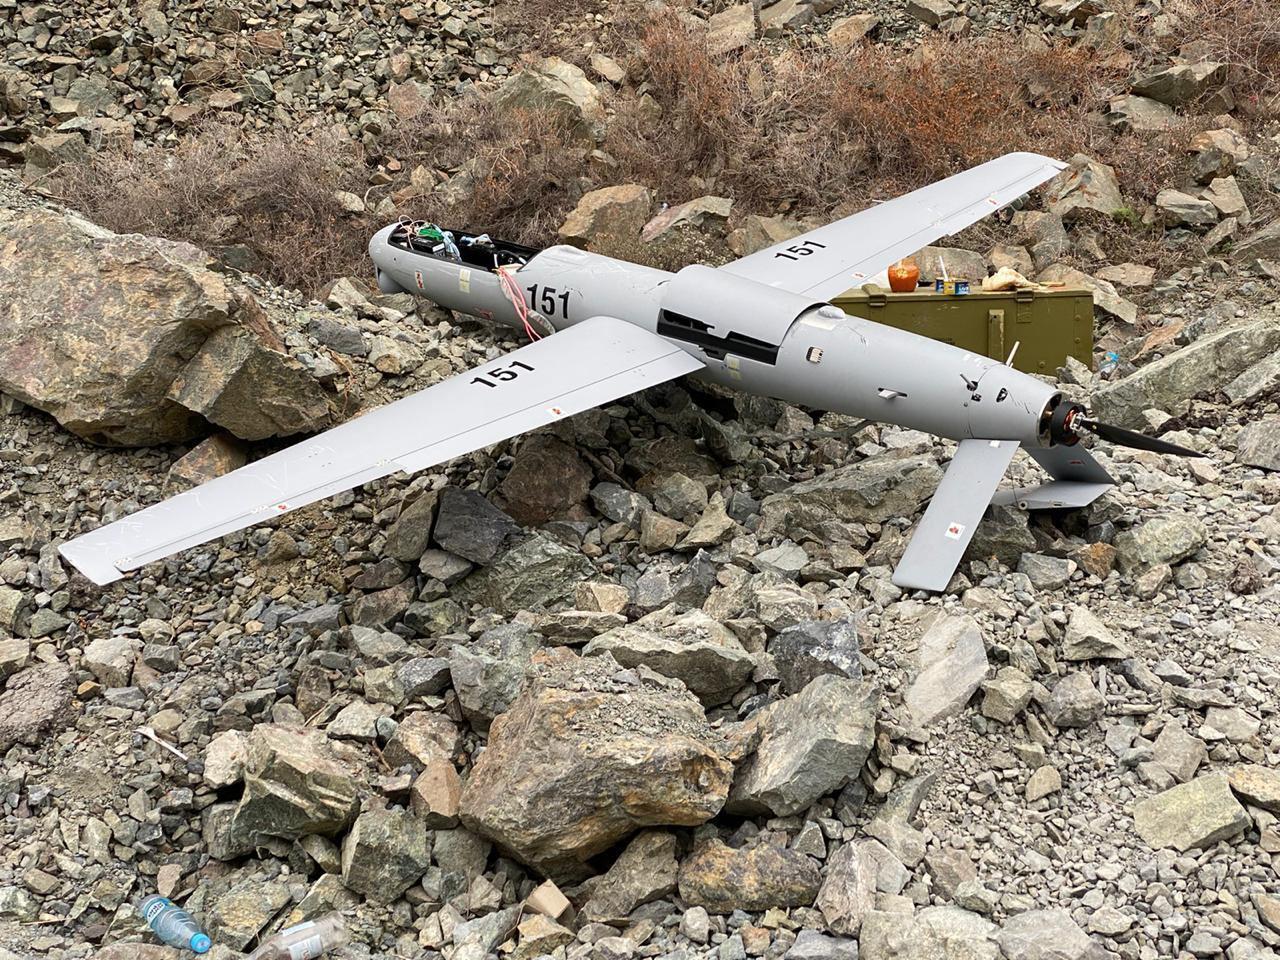 Armenia Downs UAV, Vows Azerbaijan Won't Have Nagorno-Karabakh, Ceasefire Entirely Failed